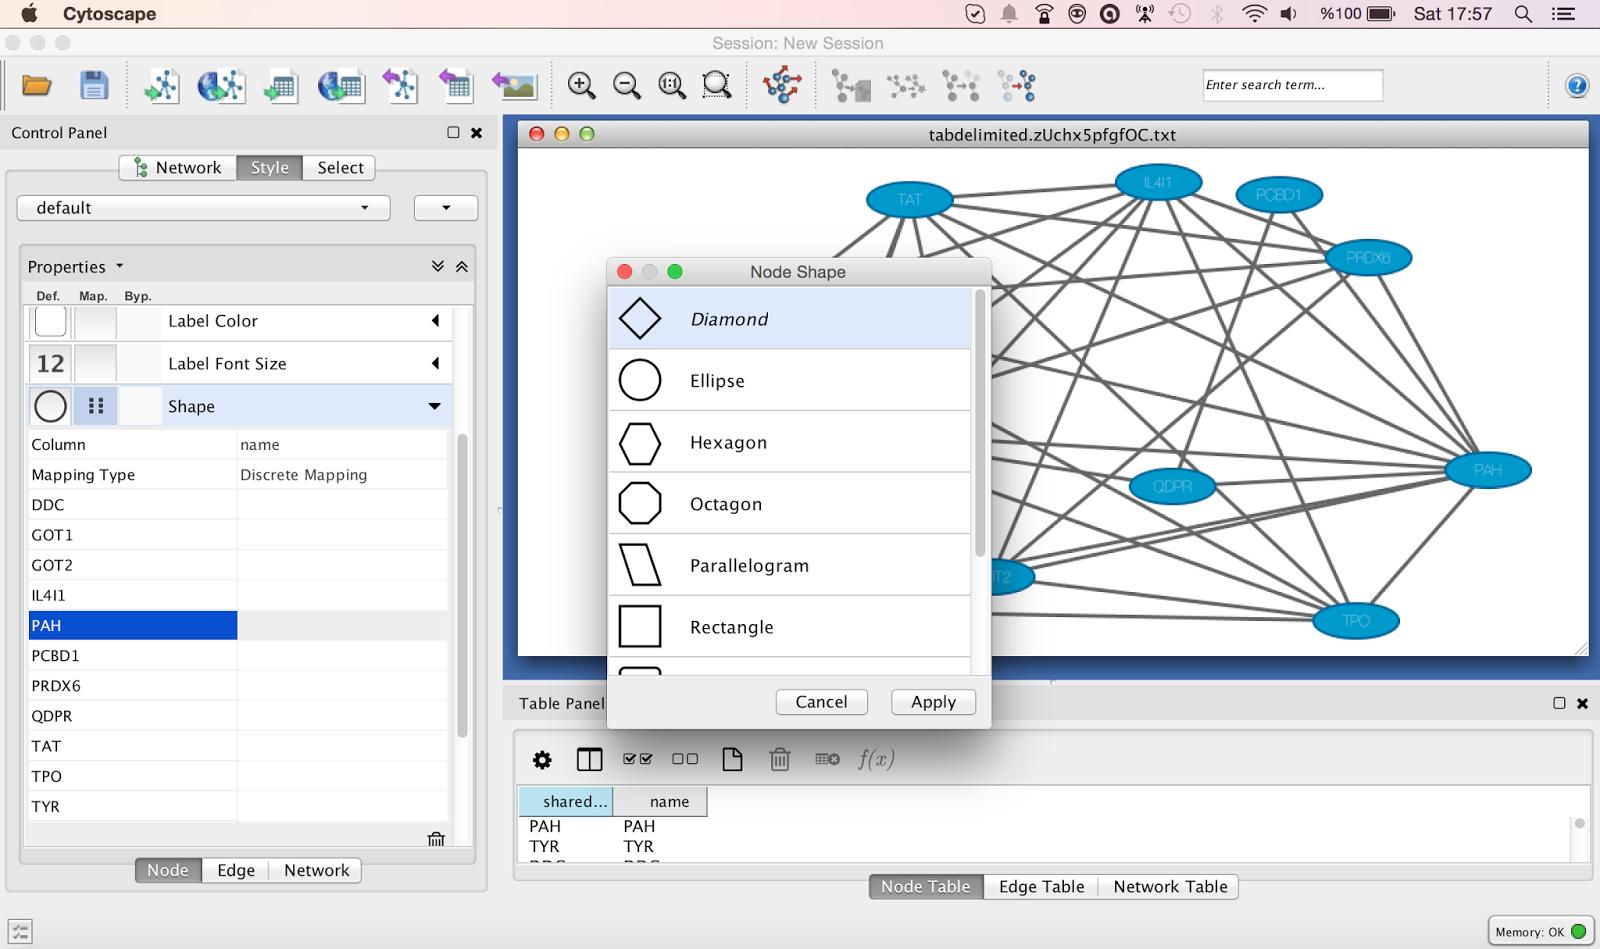 Evrimsel Biyoinformatik: Cytoscape [Network Analysis ...